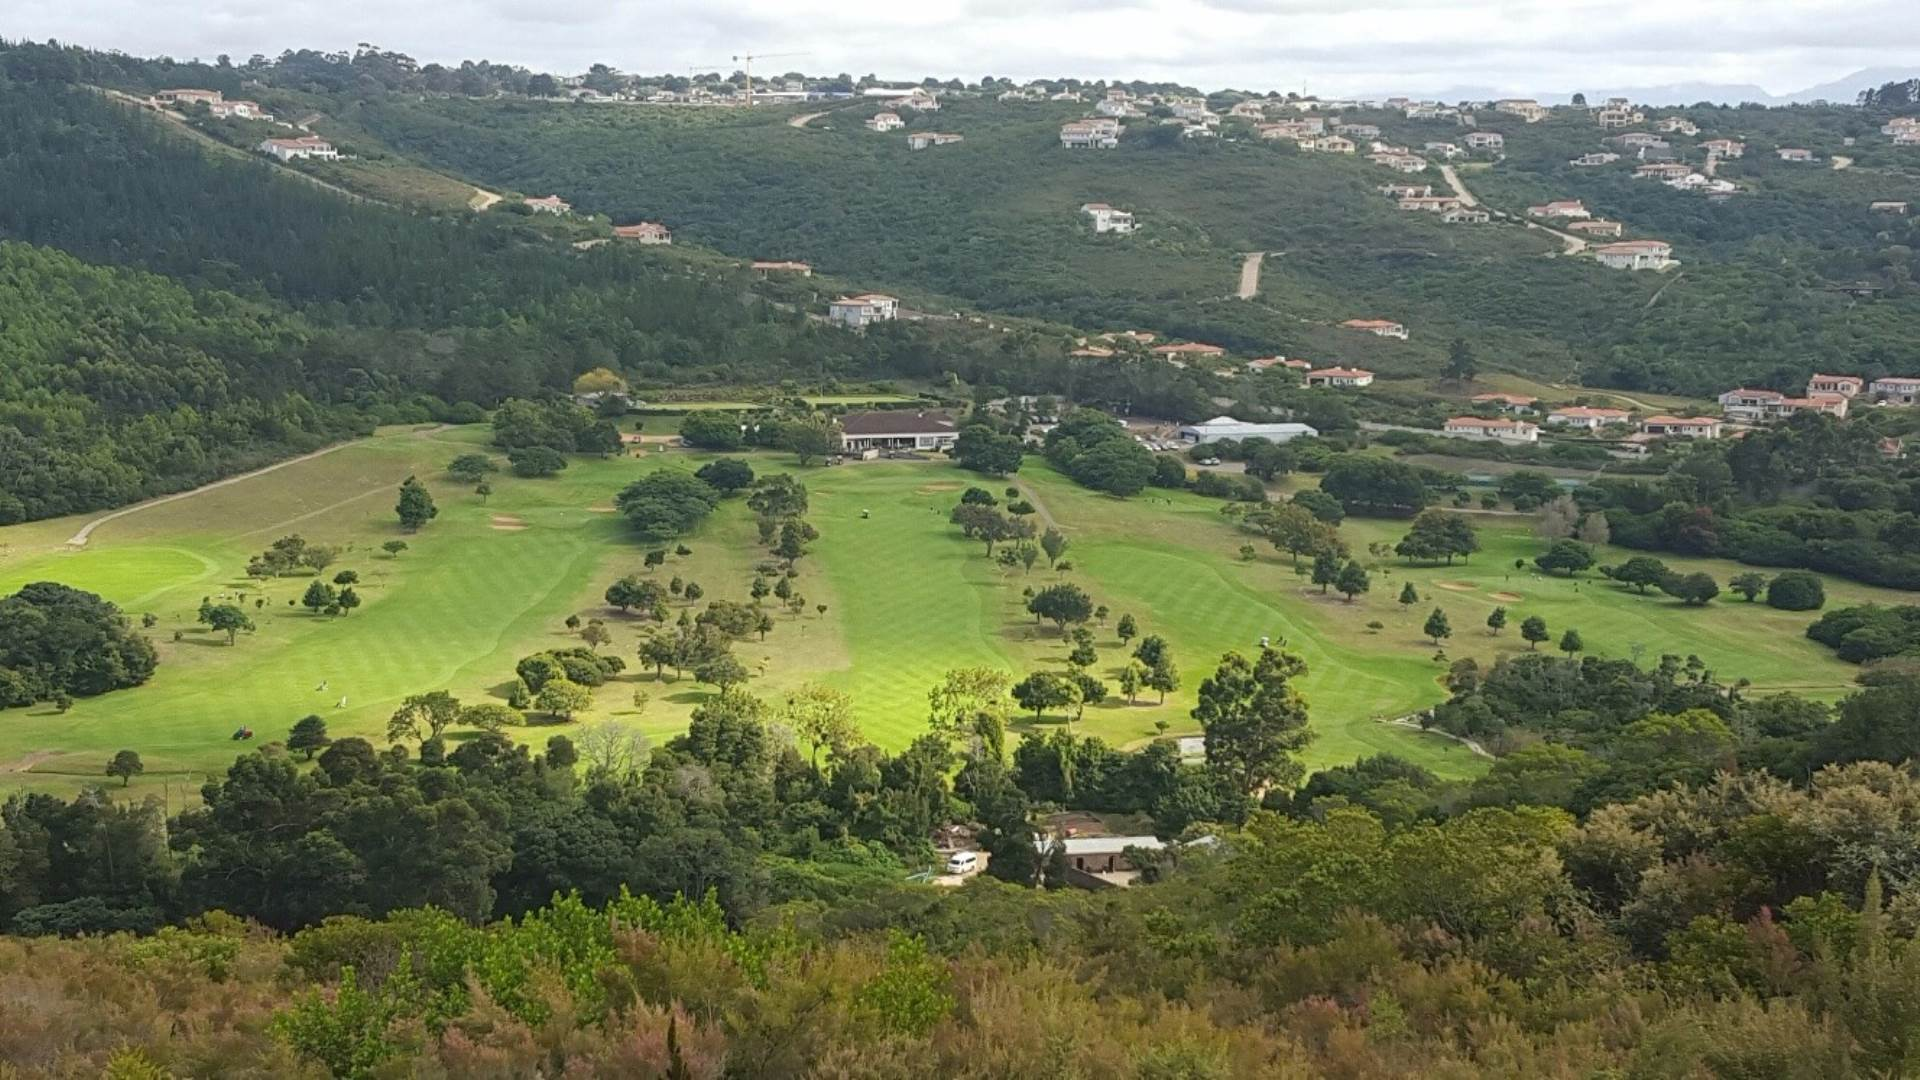 Vacant Land Residential For Sale In Brackenridge